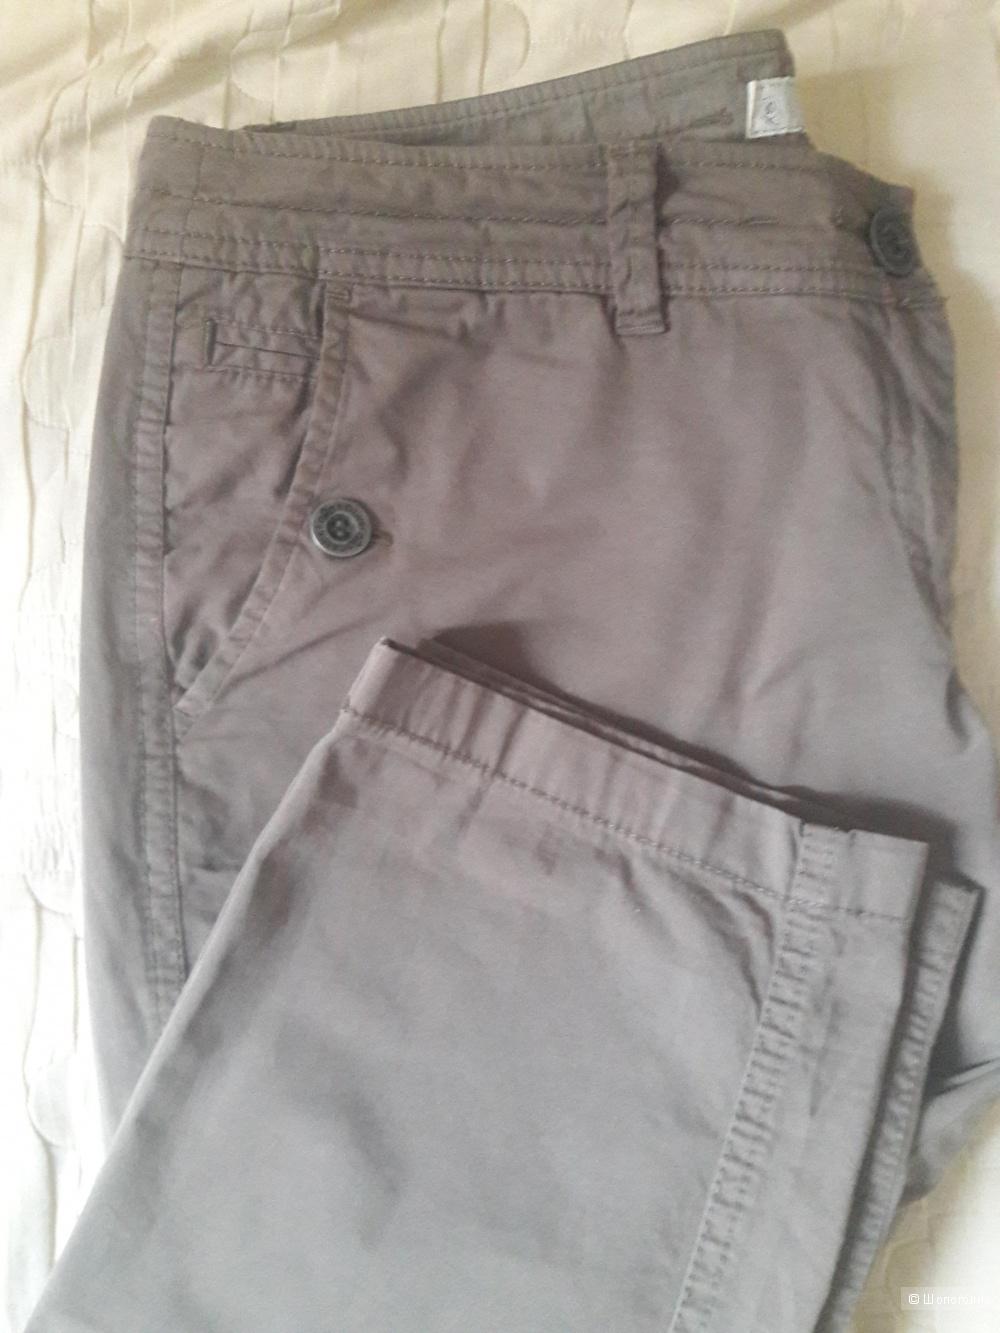 S.Oliver Casual Clothing: классические брючки-чиносы, 48-50